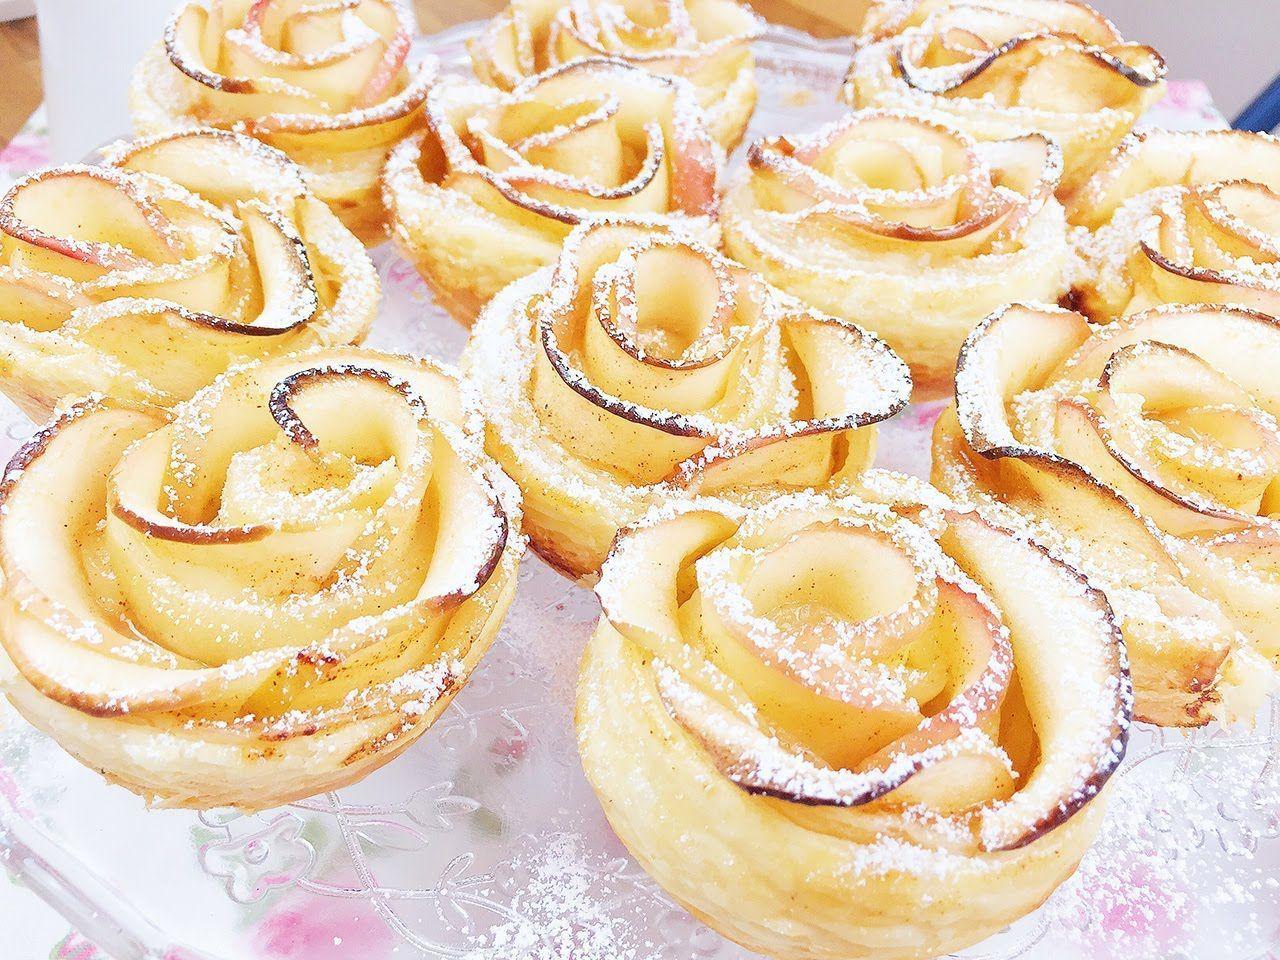 Apfel Rosen Cupcakes / Apple Rose Apfelrosen #apfelrosenblätterteig Apfel Rosen Cupcakes / Apple Rose Apfelrosen #apfelrosenblätterteig Apfel Rosen Cupcakes / Apple Rose Apfelrosen #apfelrosenblätterteig Apfel Rosen Cupcakes / Apple Rose Apfelrosen #blätterteigrosenmitapfel